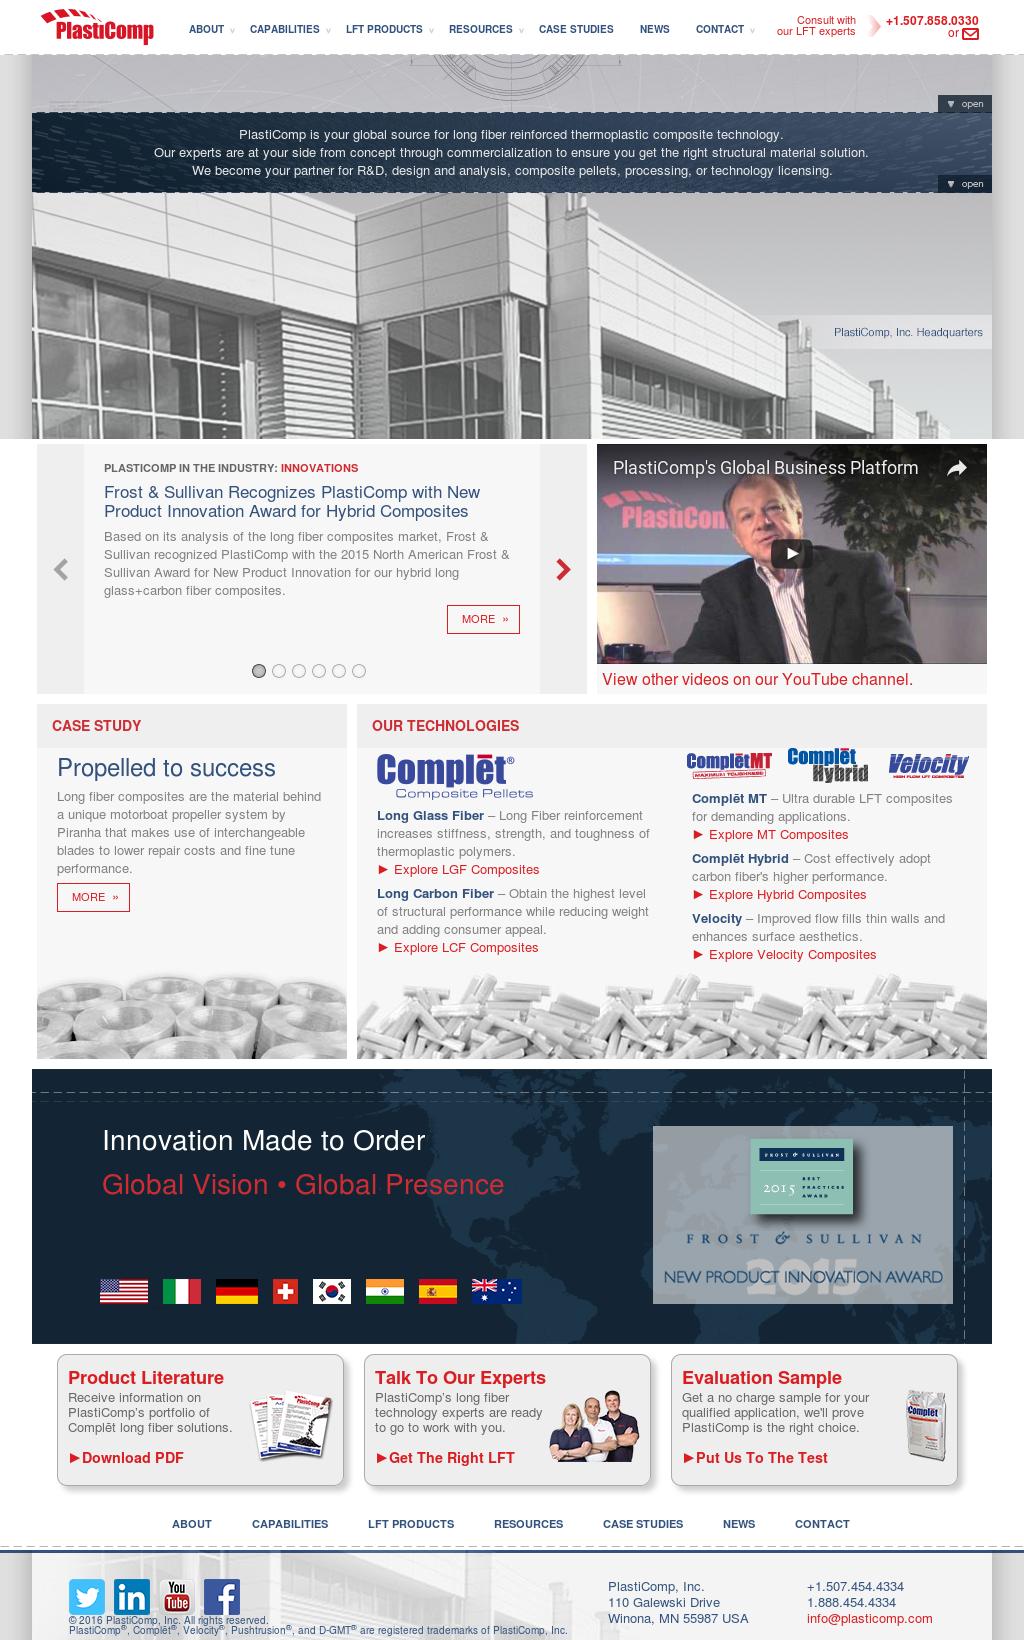 Plasticomp Competitors, Revenue and Employees - Owler Company Profile